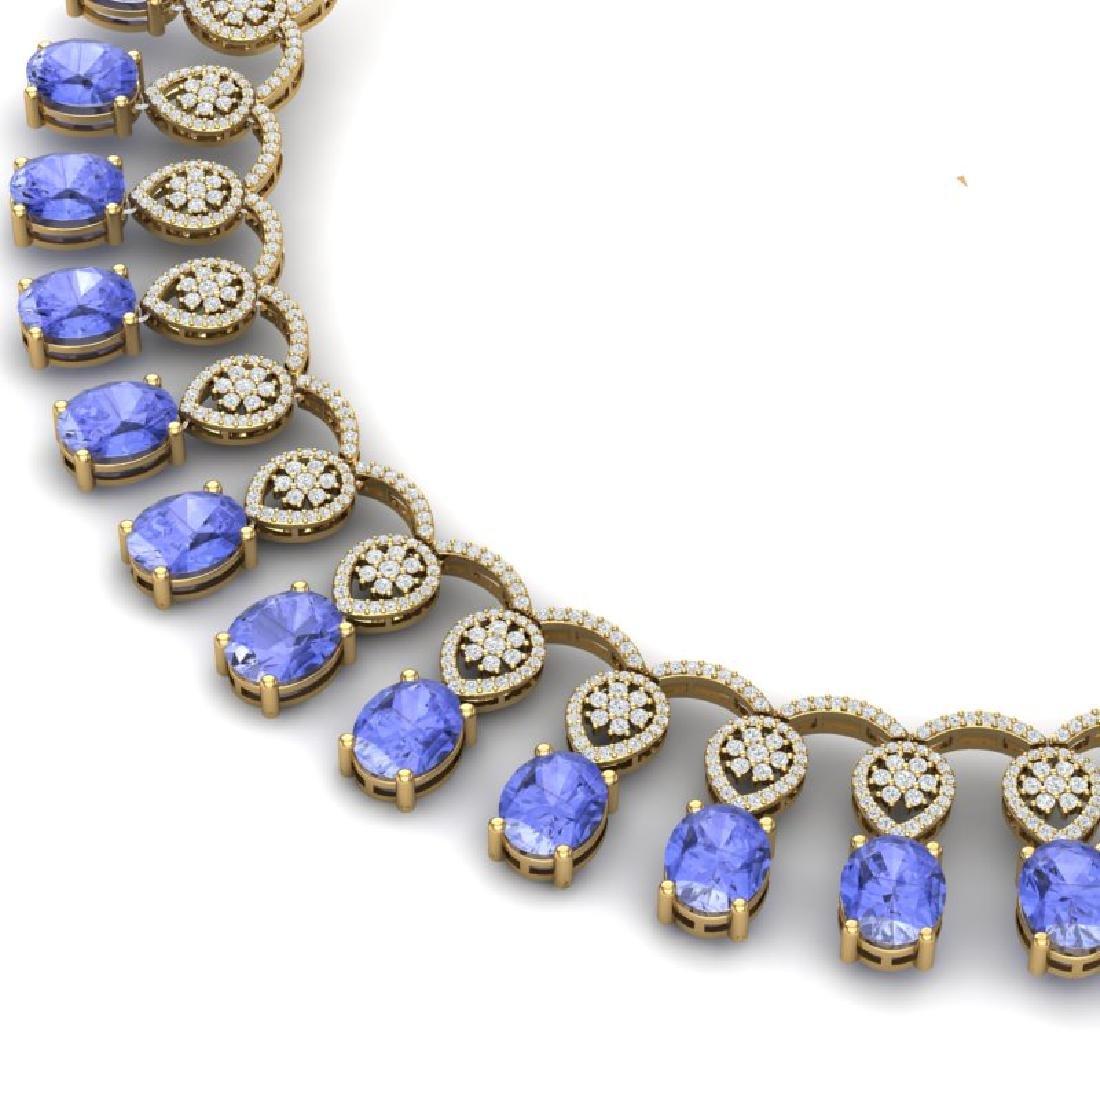 45.56 CTW Royalty Tanzanite & VS Diamond Necklace 18K